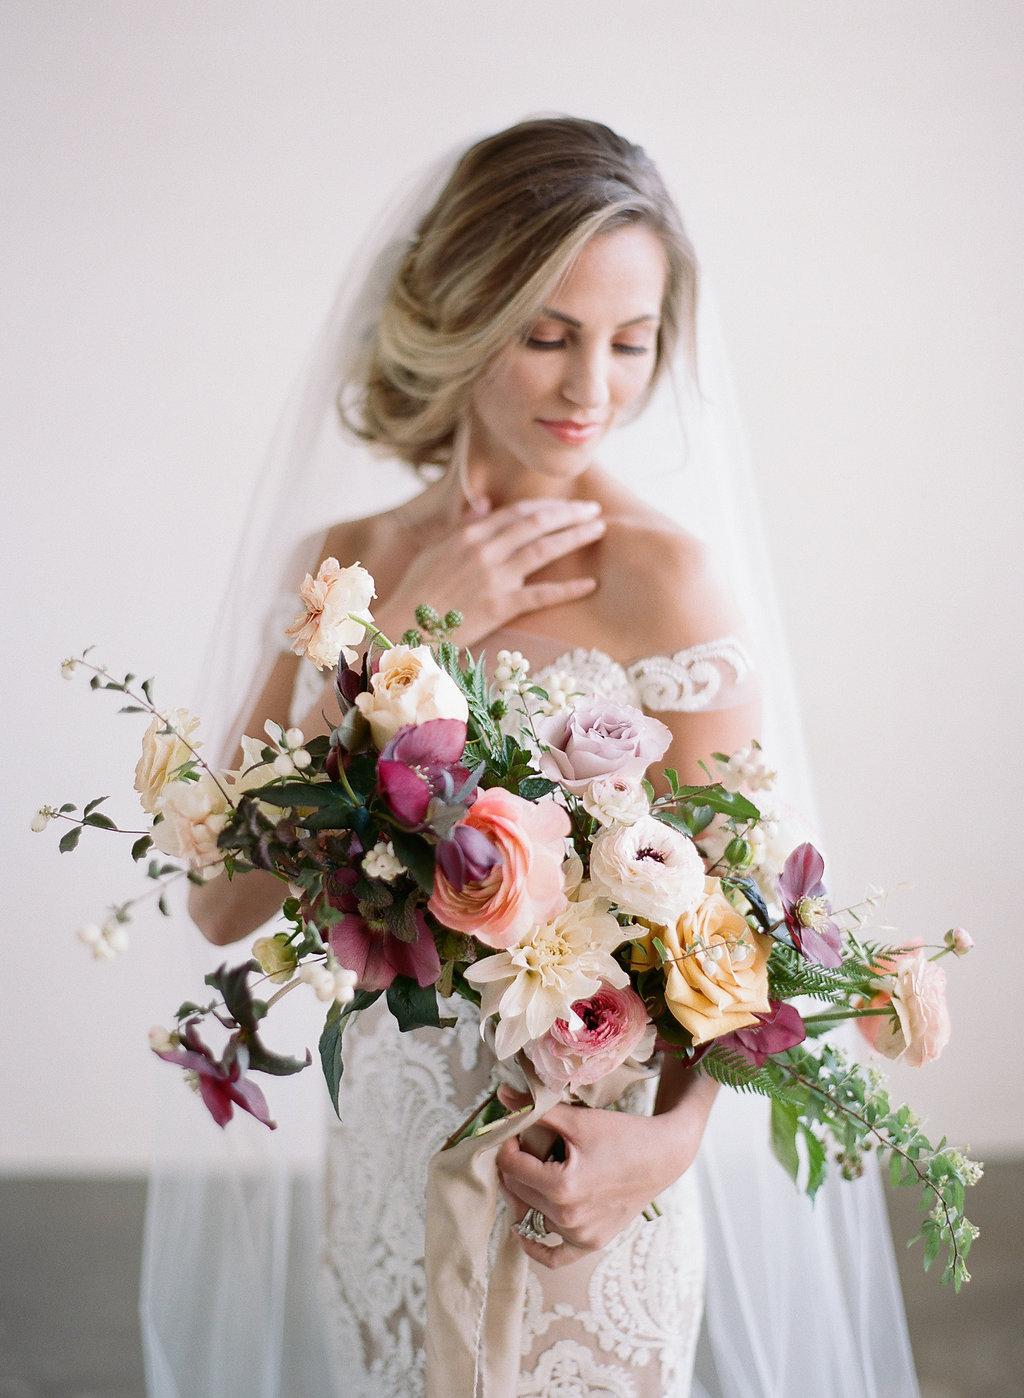 Bridal_Bouquet_Houston_Kelly_Hornberger.jpg